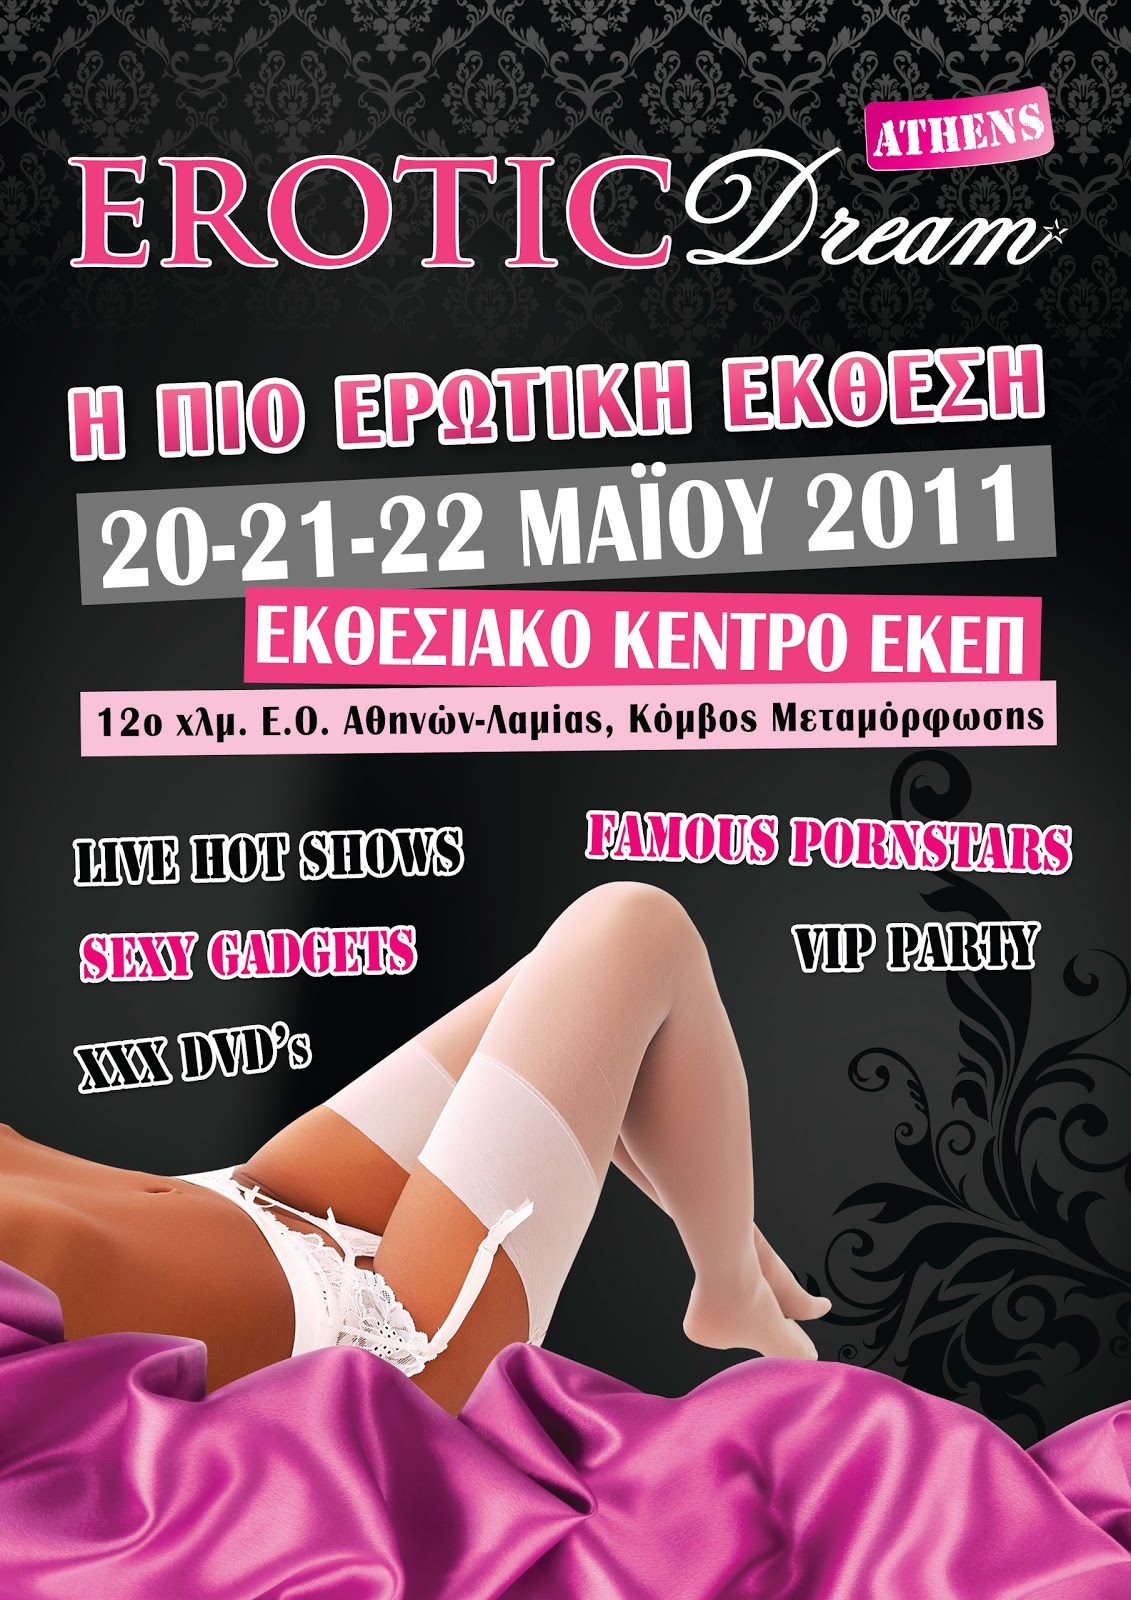 http://1.bp.blogspot.com/-nYGUUZvdl3o/TcApORWRhuI/AAAAAAAAB8s/5nfRXAAEwuA/s1600/EROTIC-ATHENS-A.jpg